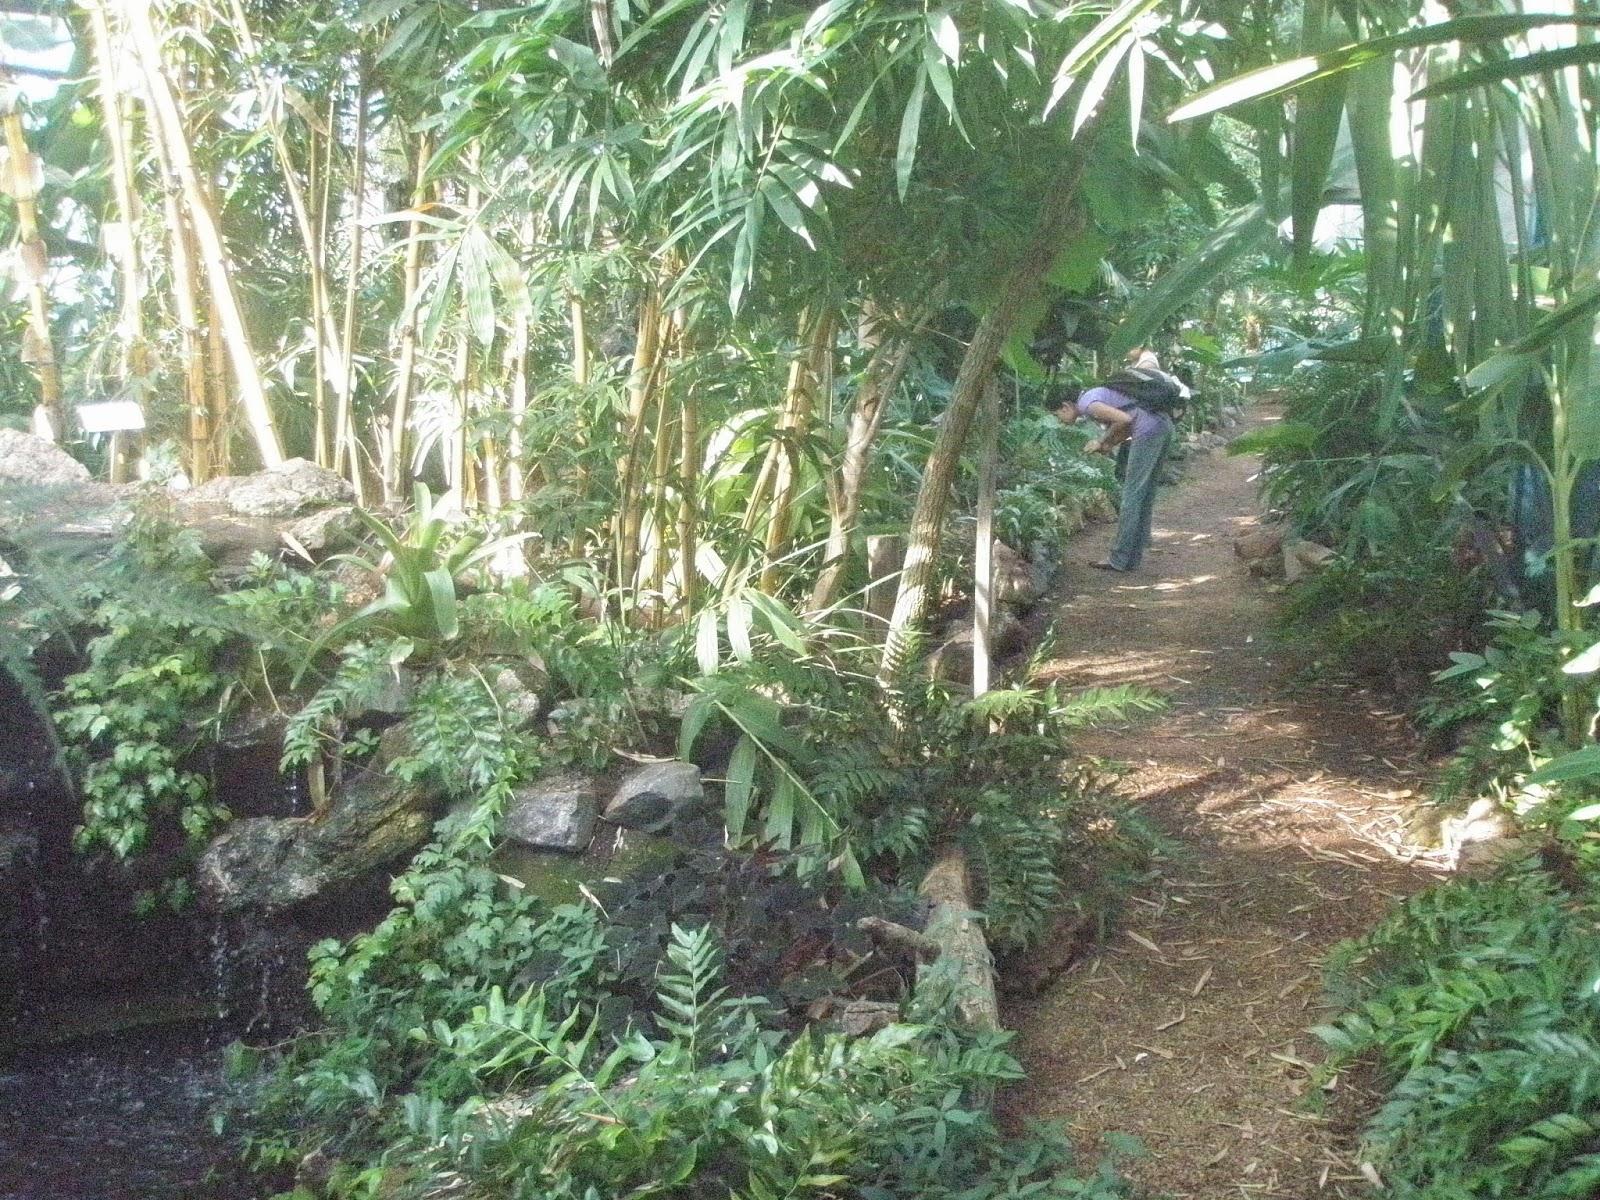 Jard n bot nico de c rdoba actividades 2013 for Talleres jardin botanico